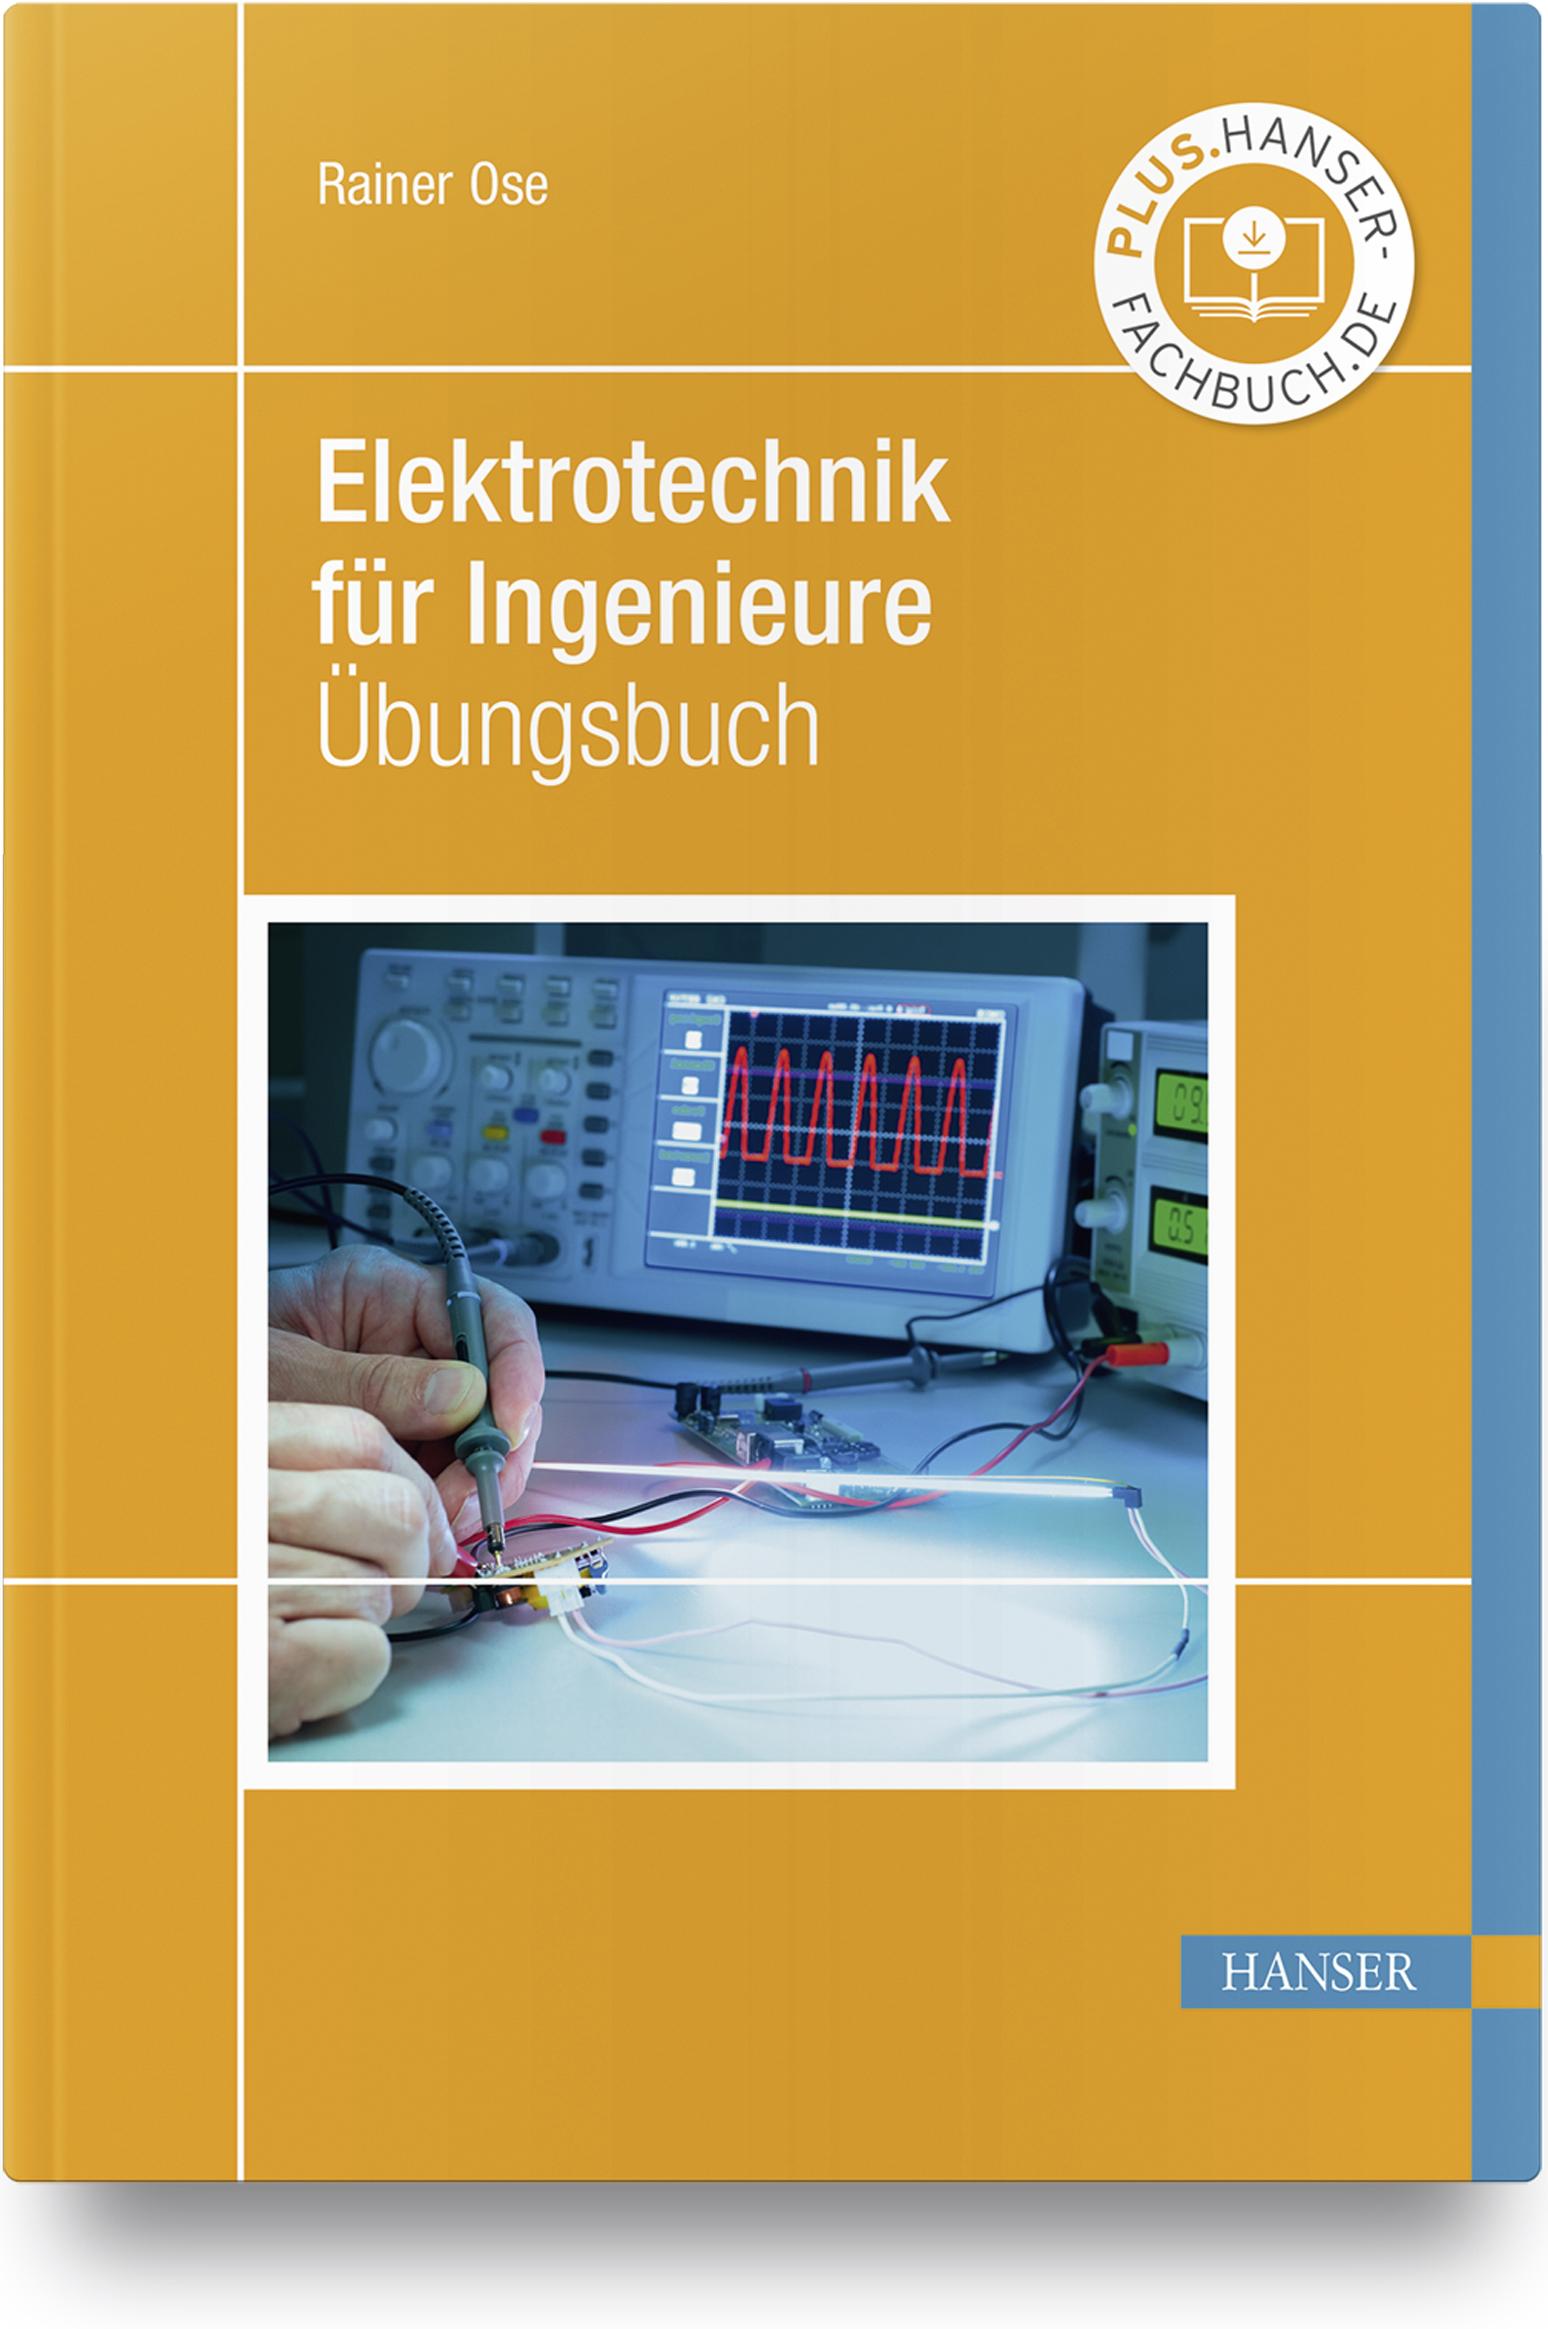 Ose, Elektrotechnik für Ingenieure, 978-3-446-46444-5